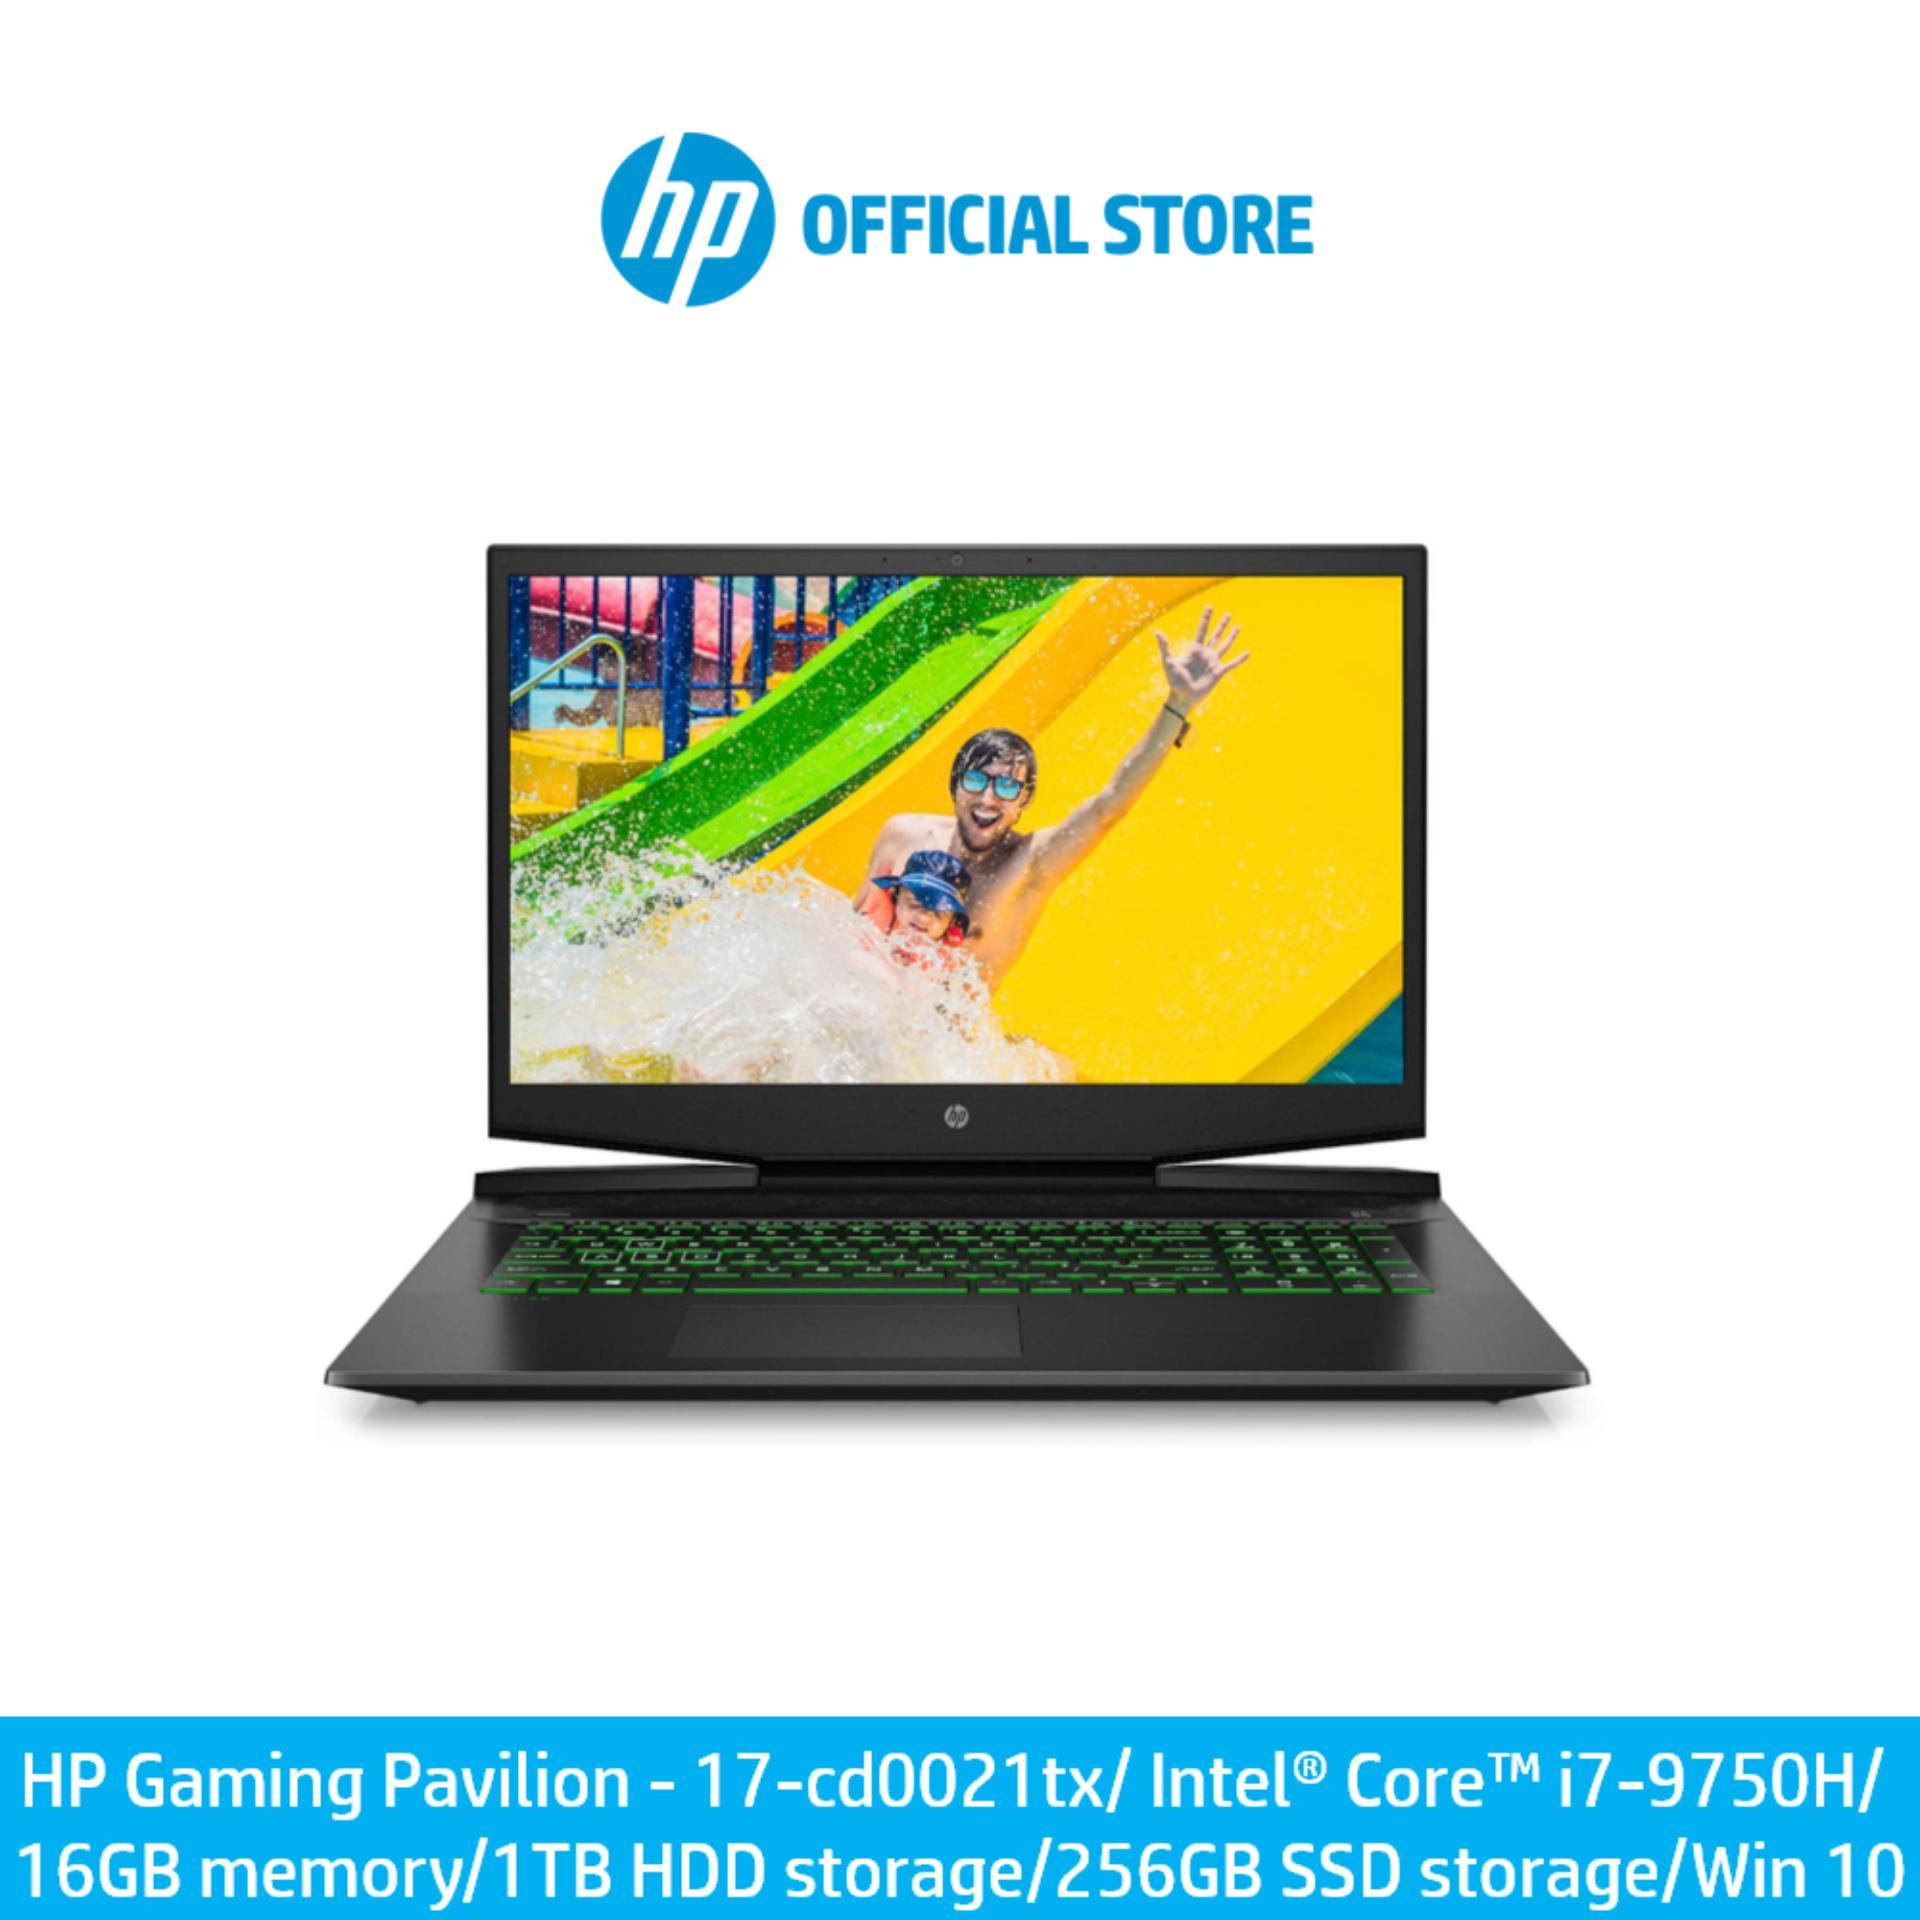 HP Gaming Pavilion - 17-cd0021tx/ Intel® Core™ i7-9750H/ 16 GB memory/ 1 TB HDD storage/ 256 GB SSD storage/ Win 10